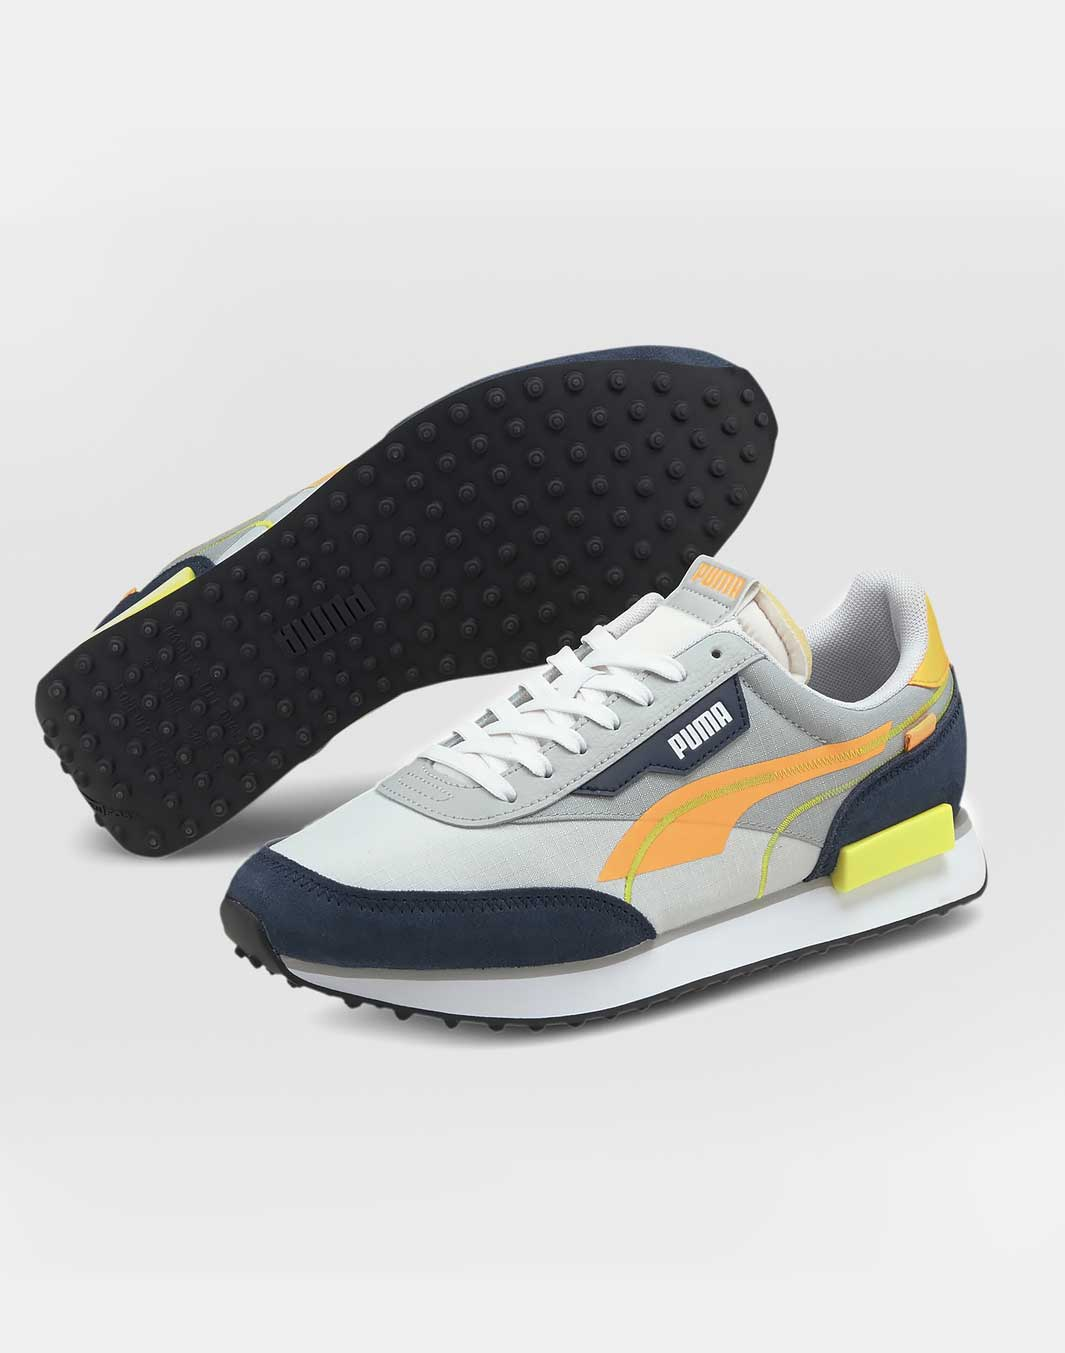 Shop Shoes at DrJays.com